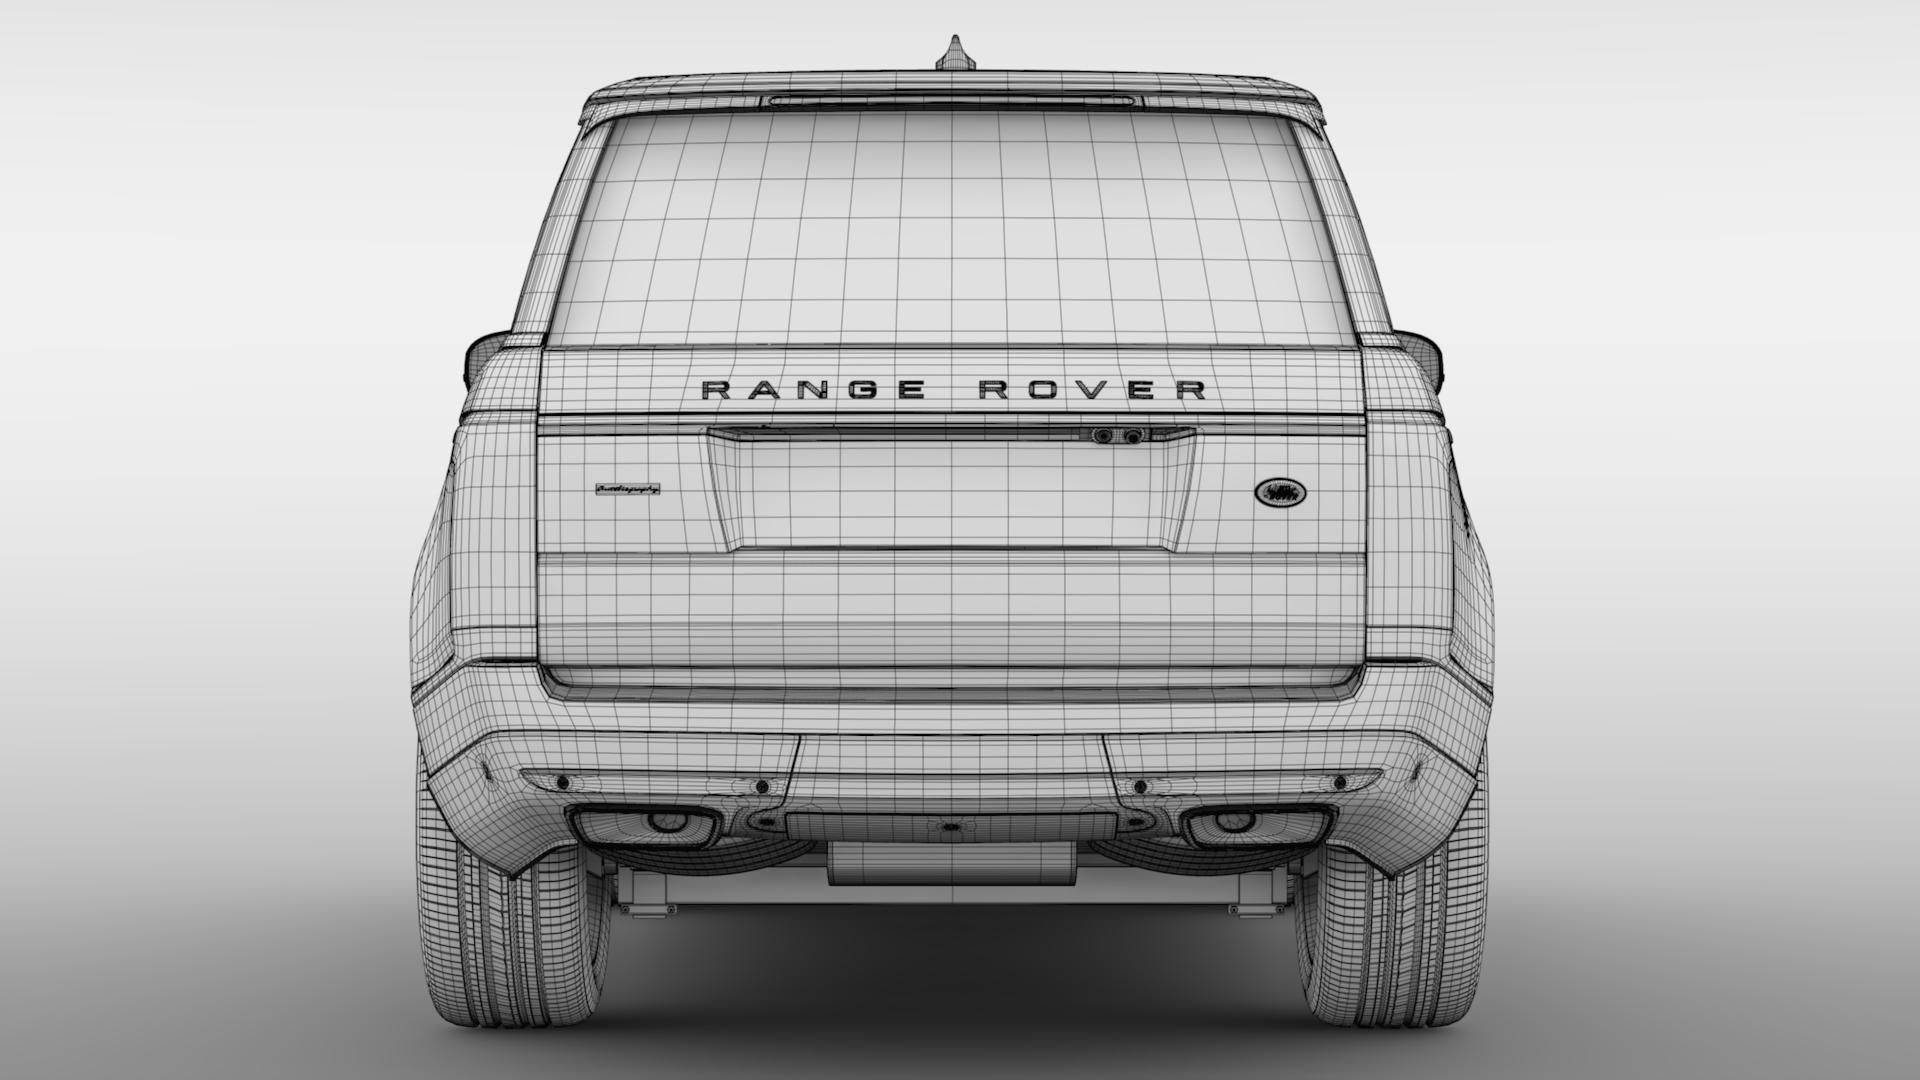 range rover autobiography hybrid (l405) 2018 3d model max fbx c4d lwo ma mb hrc xsi obj 278160